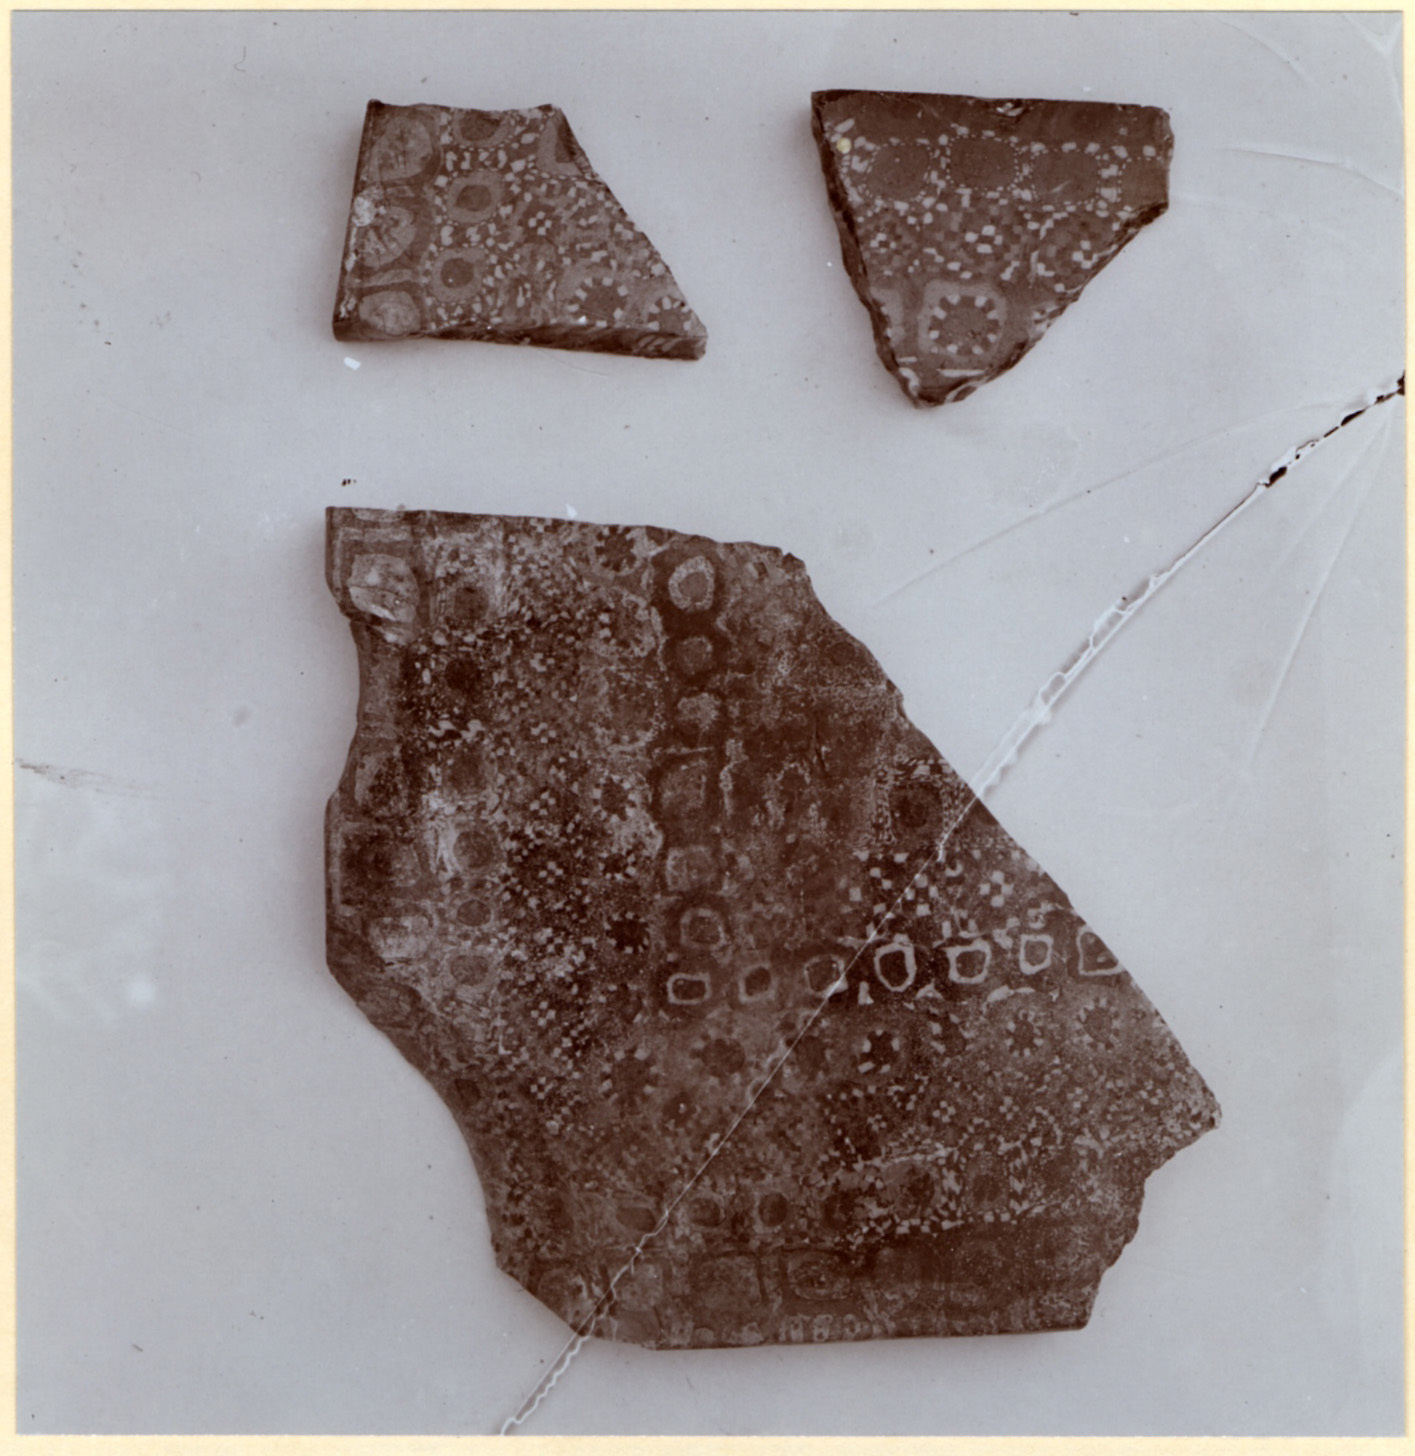 Excavation of Samarra (Iraq): Fragments of Ceramic Tiles with Decorative Motifs